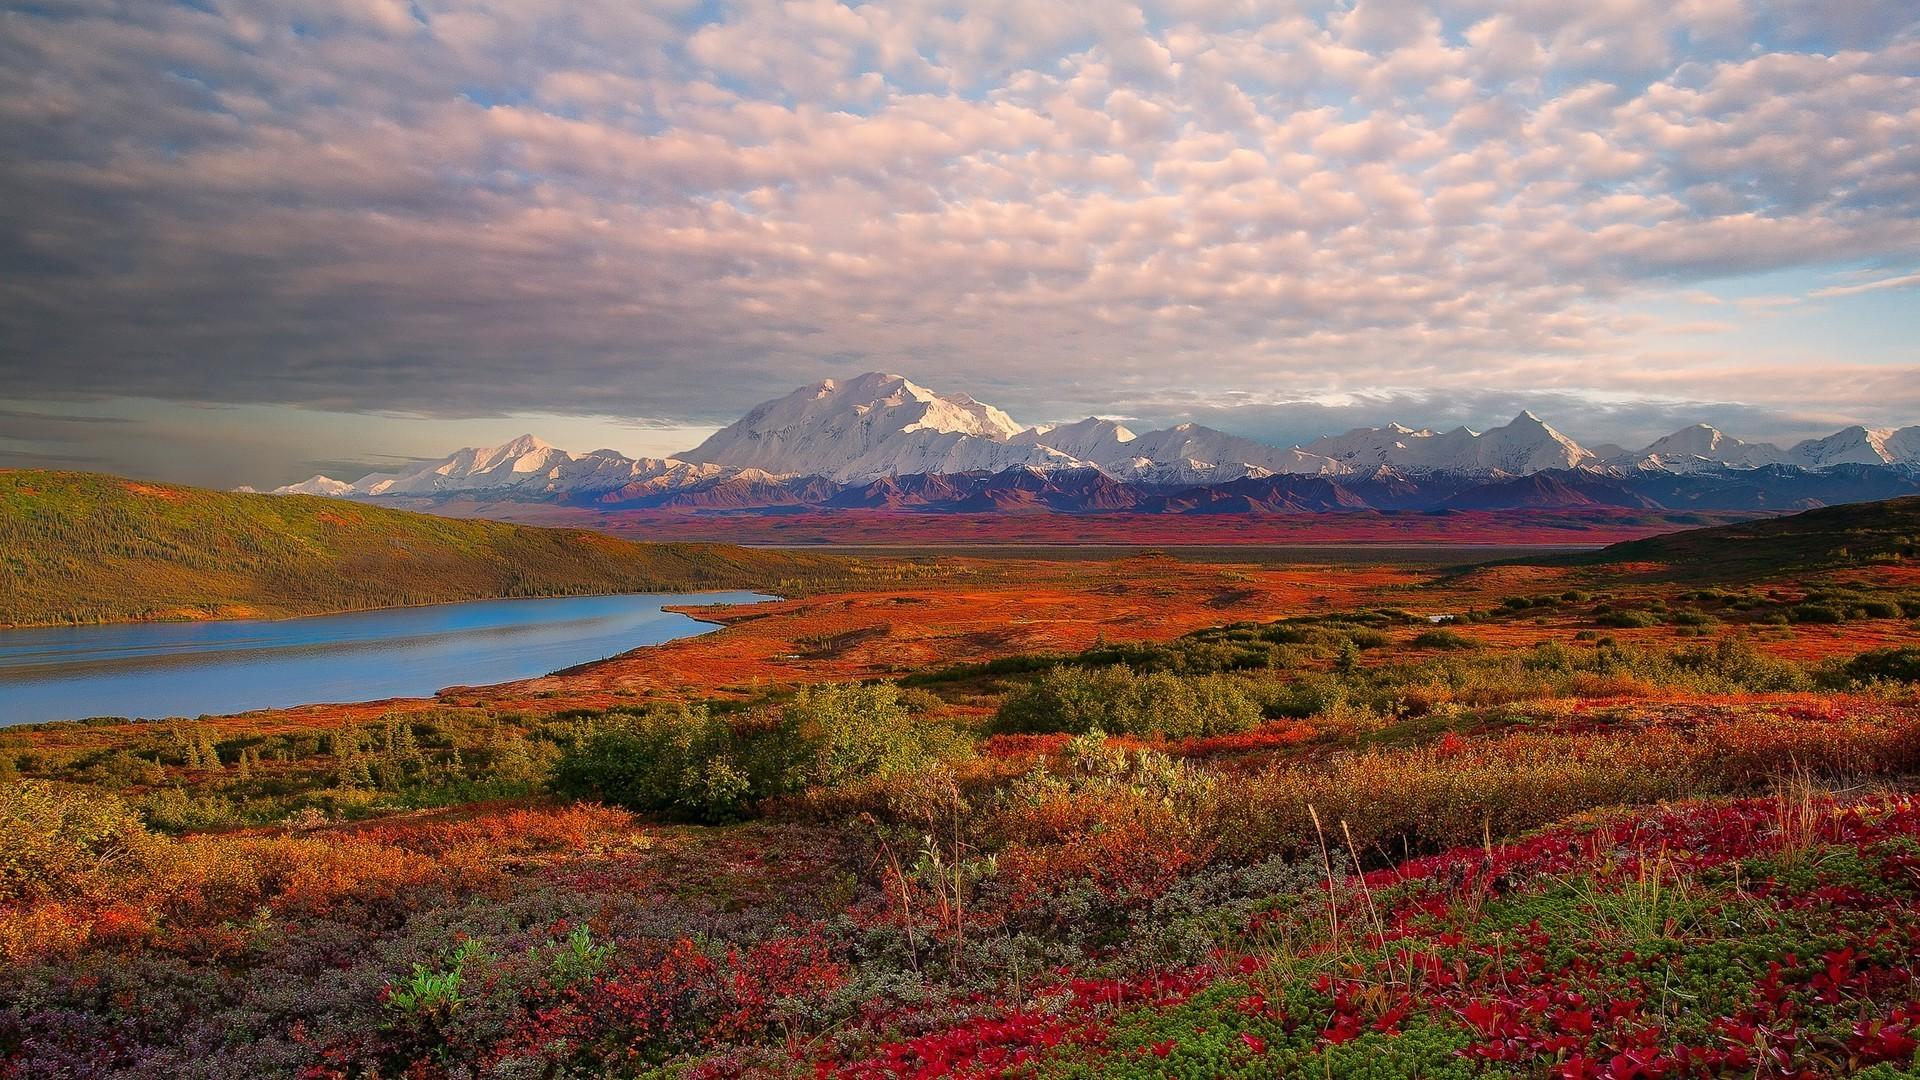 denali national park hd 31544